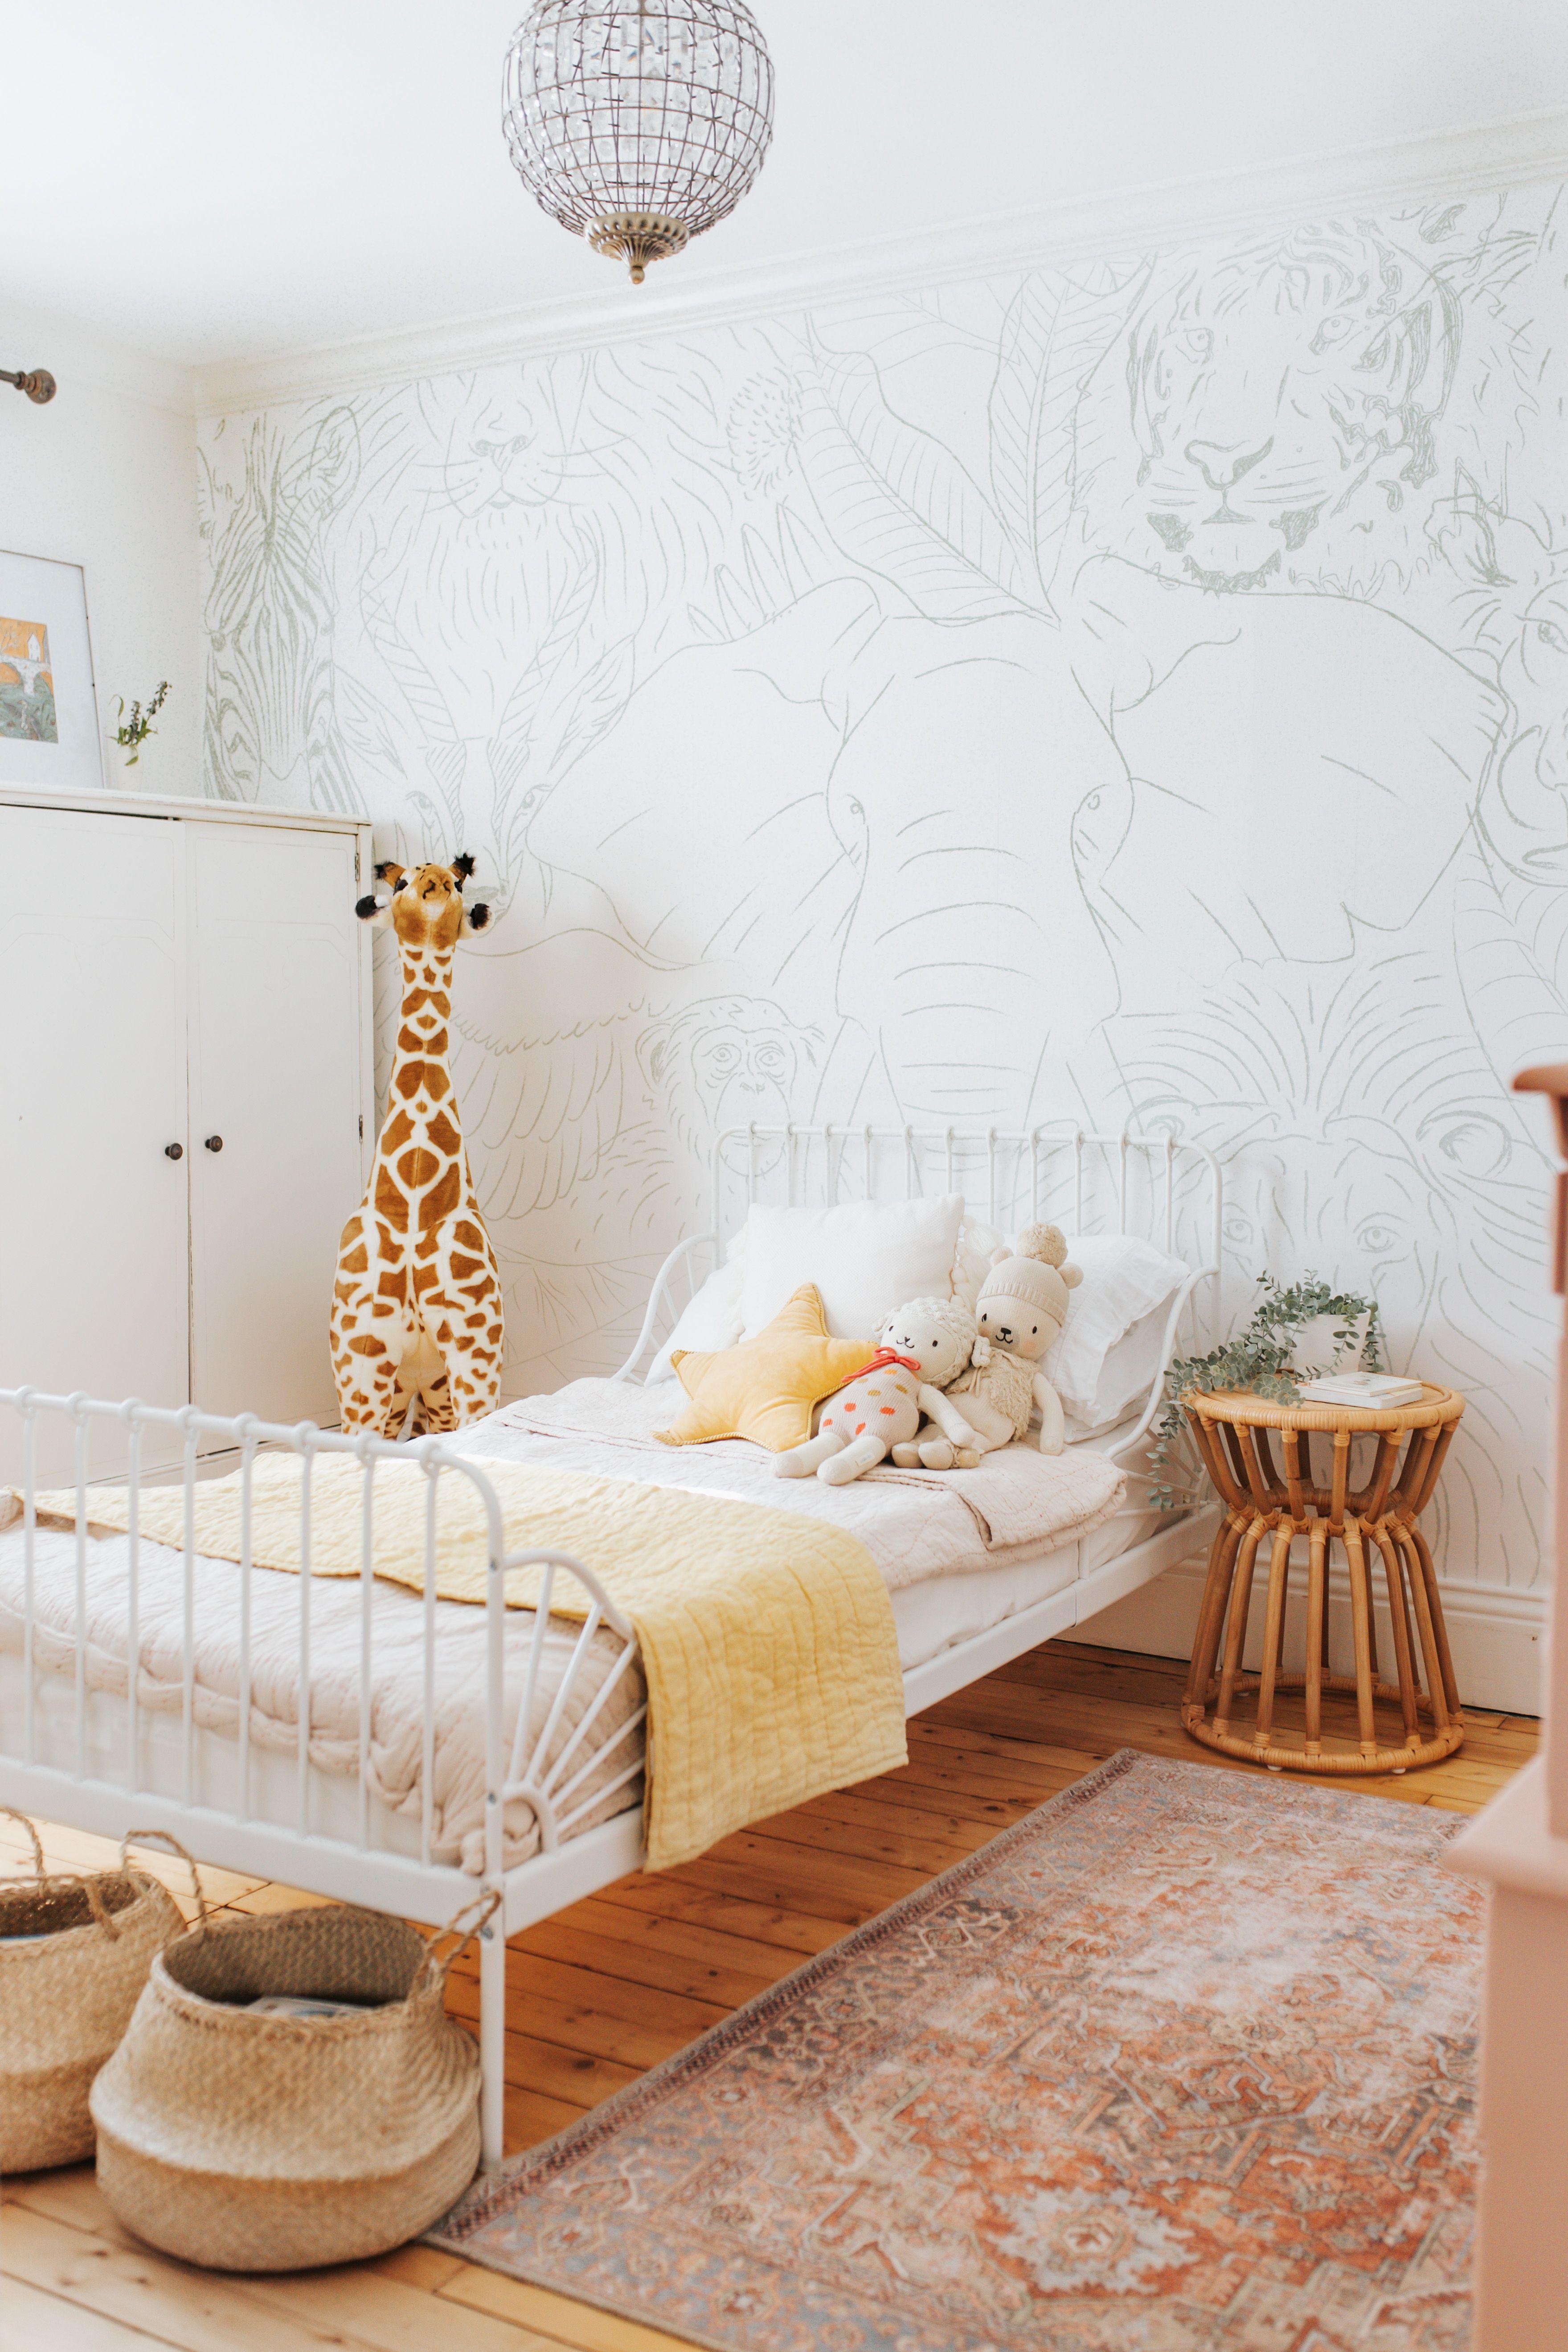 Animal Kingdom Wallpaper Kids Bedroom Wallpaper Neutral Kids Room Minimalist Kids Room Unisex bedroom wallpaper ideas